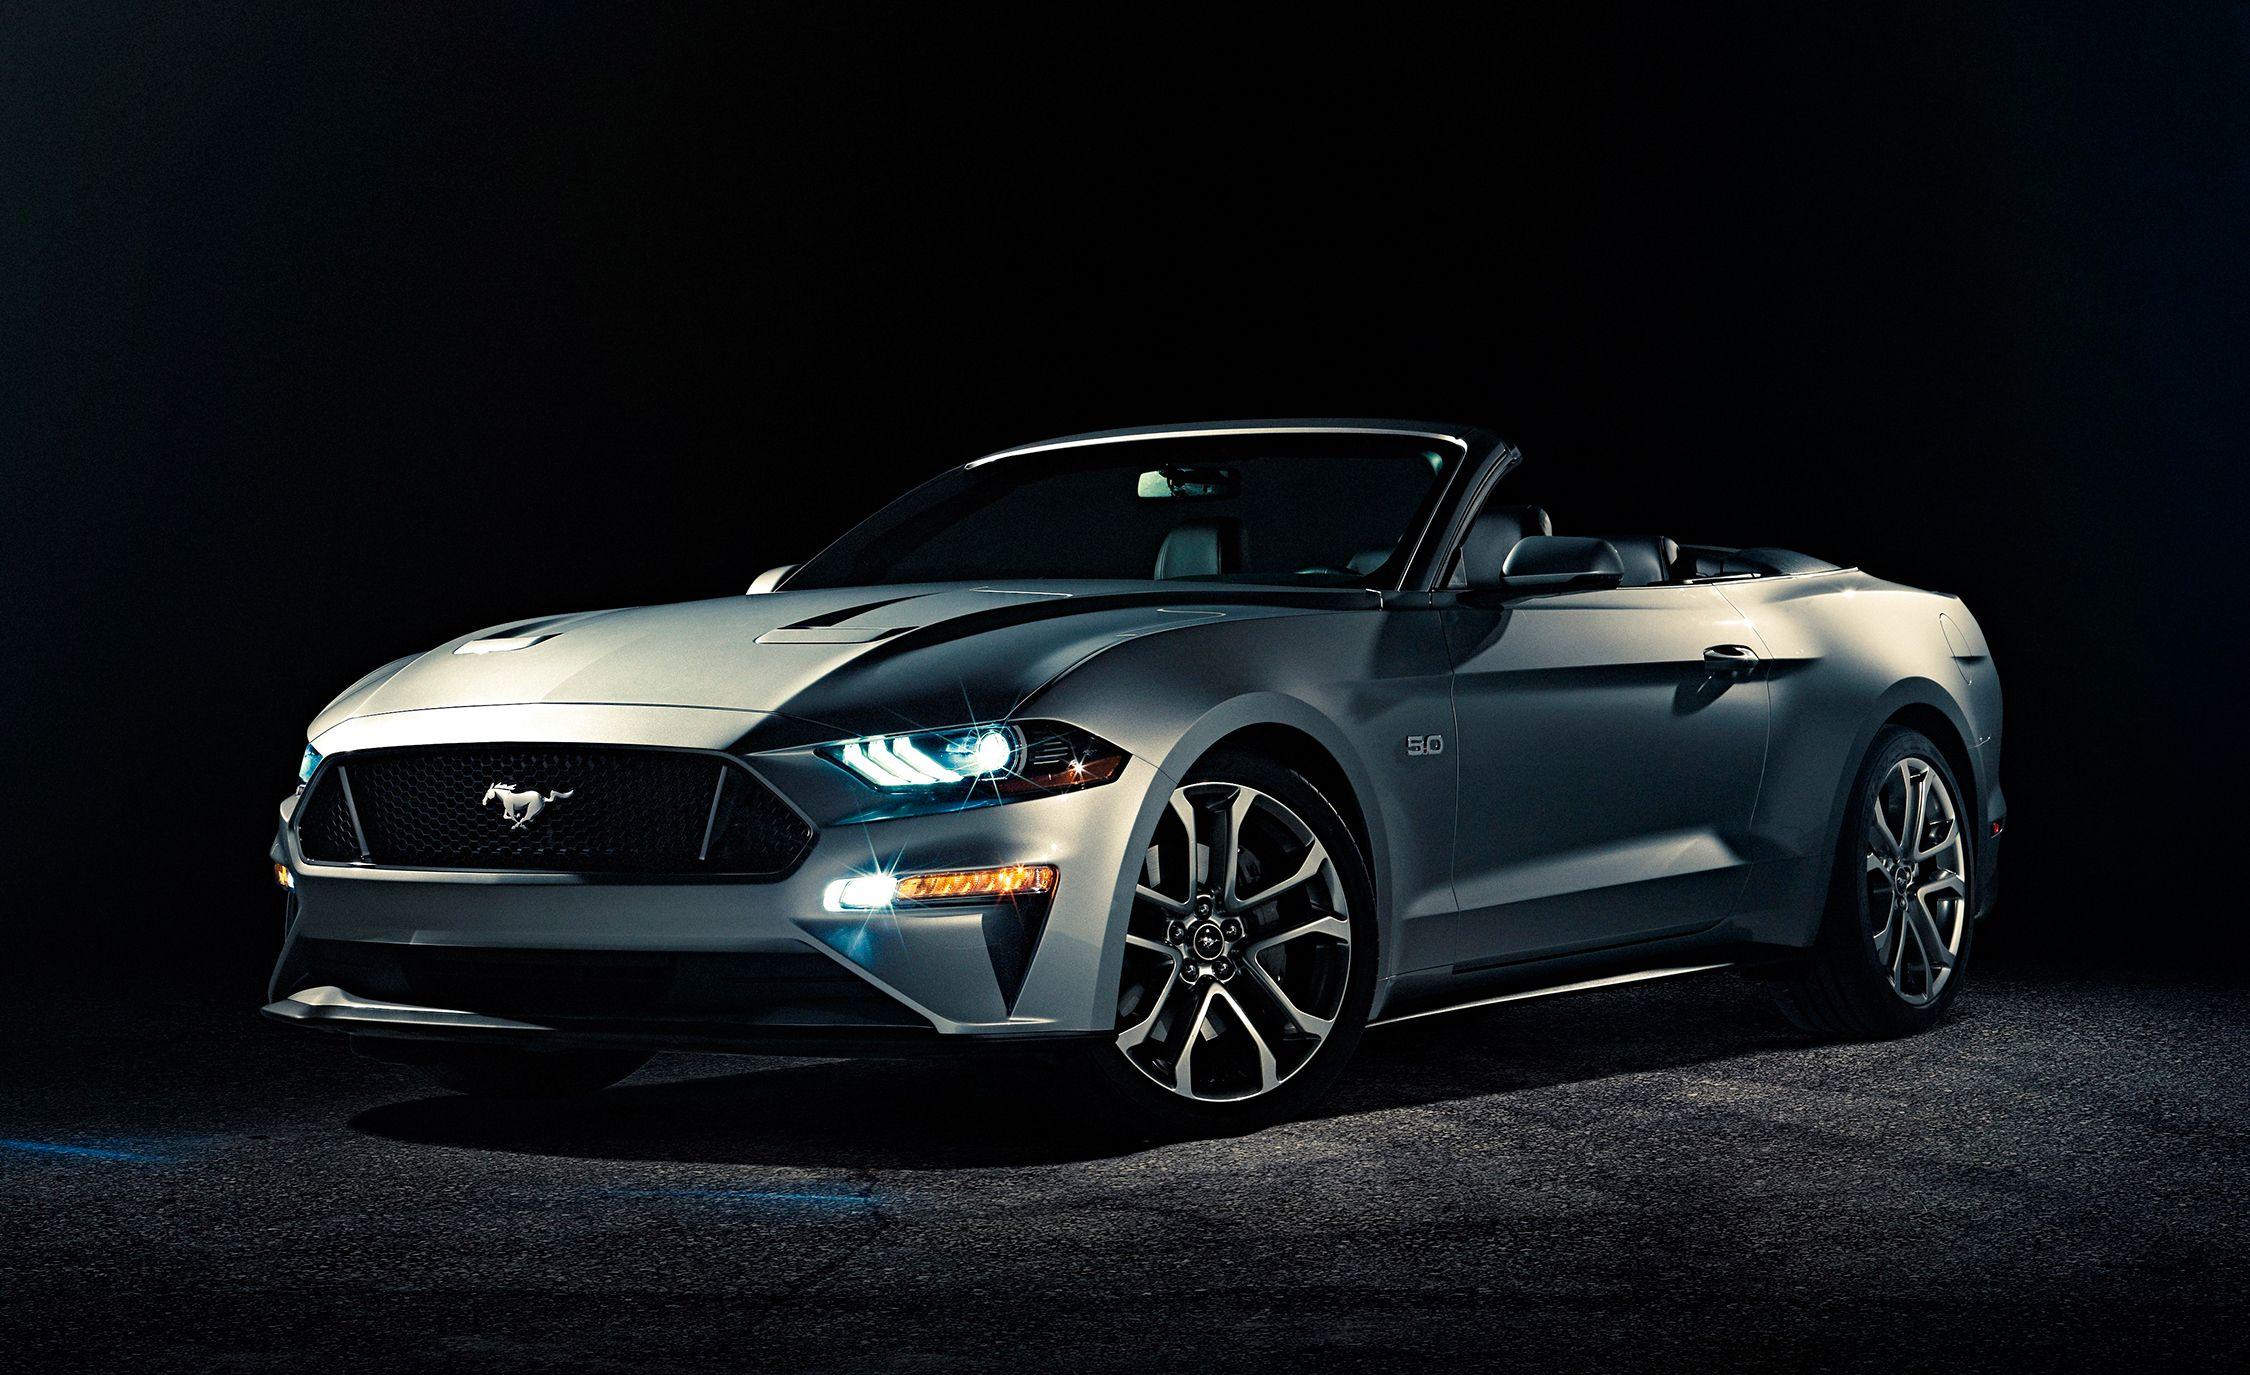 2018 Ford Mustang Convertible Renewed Droptop